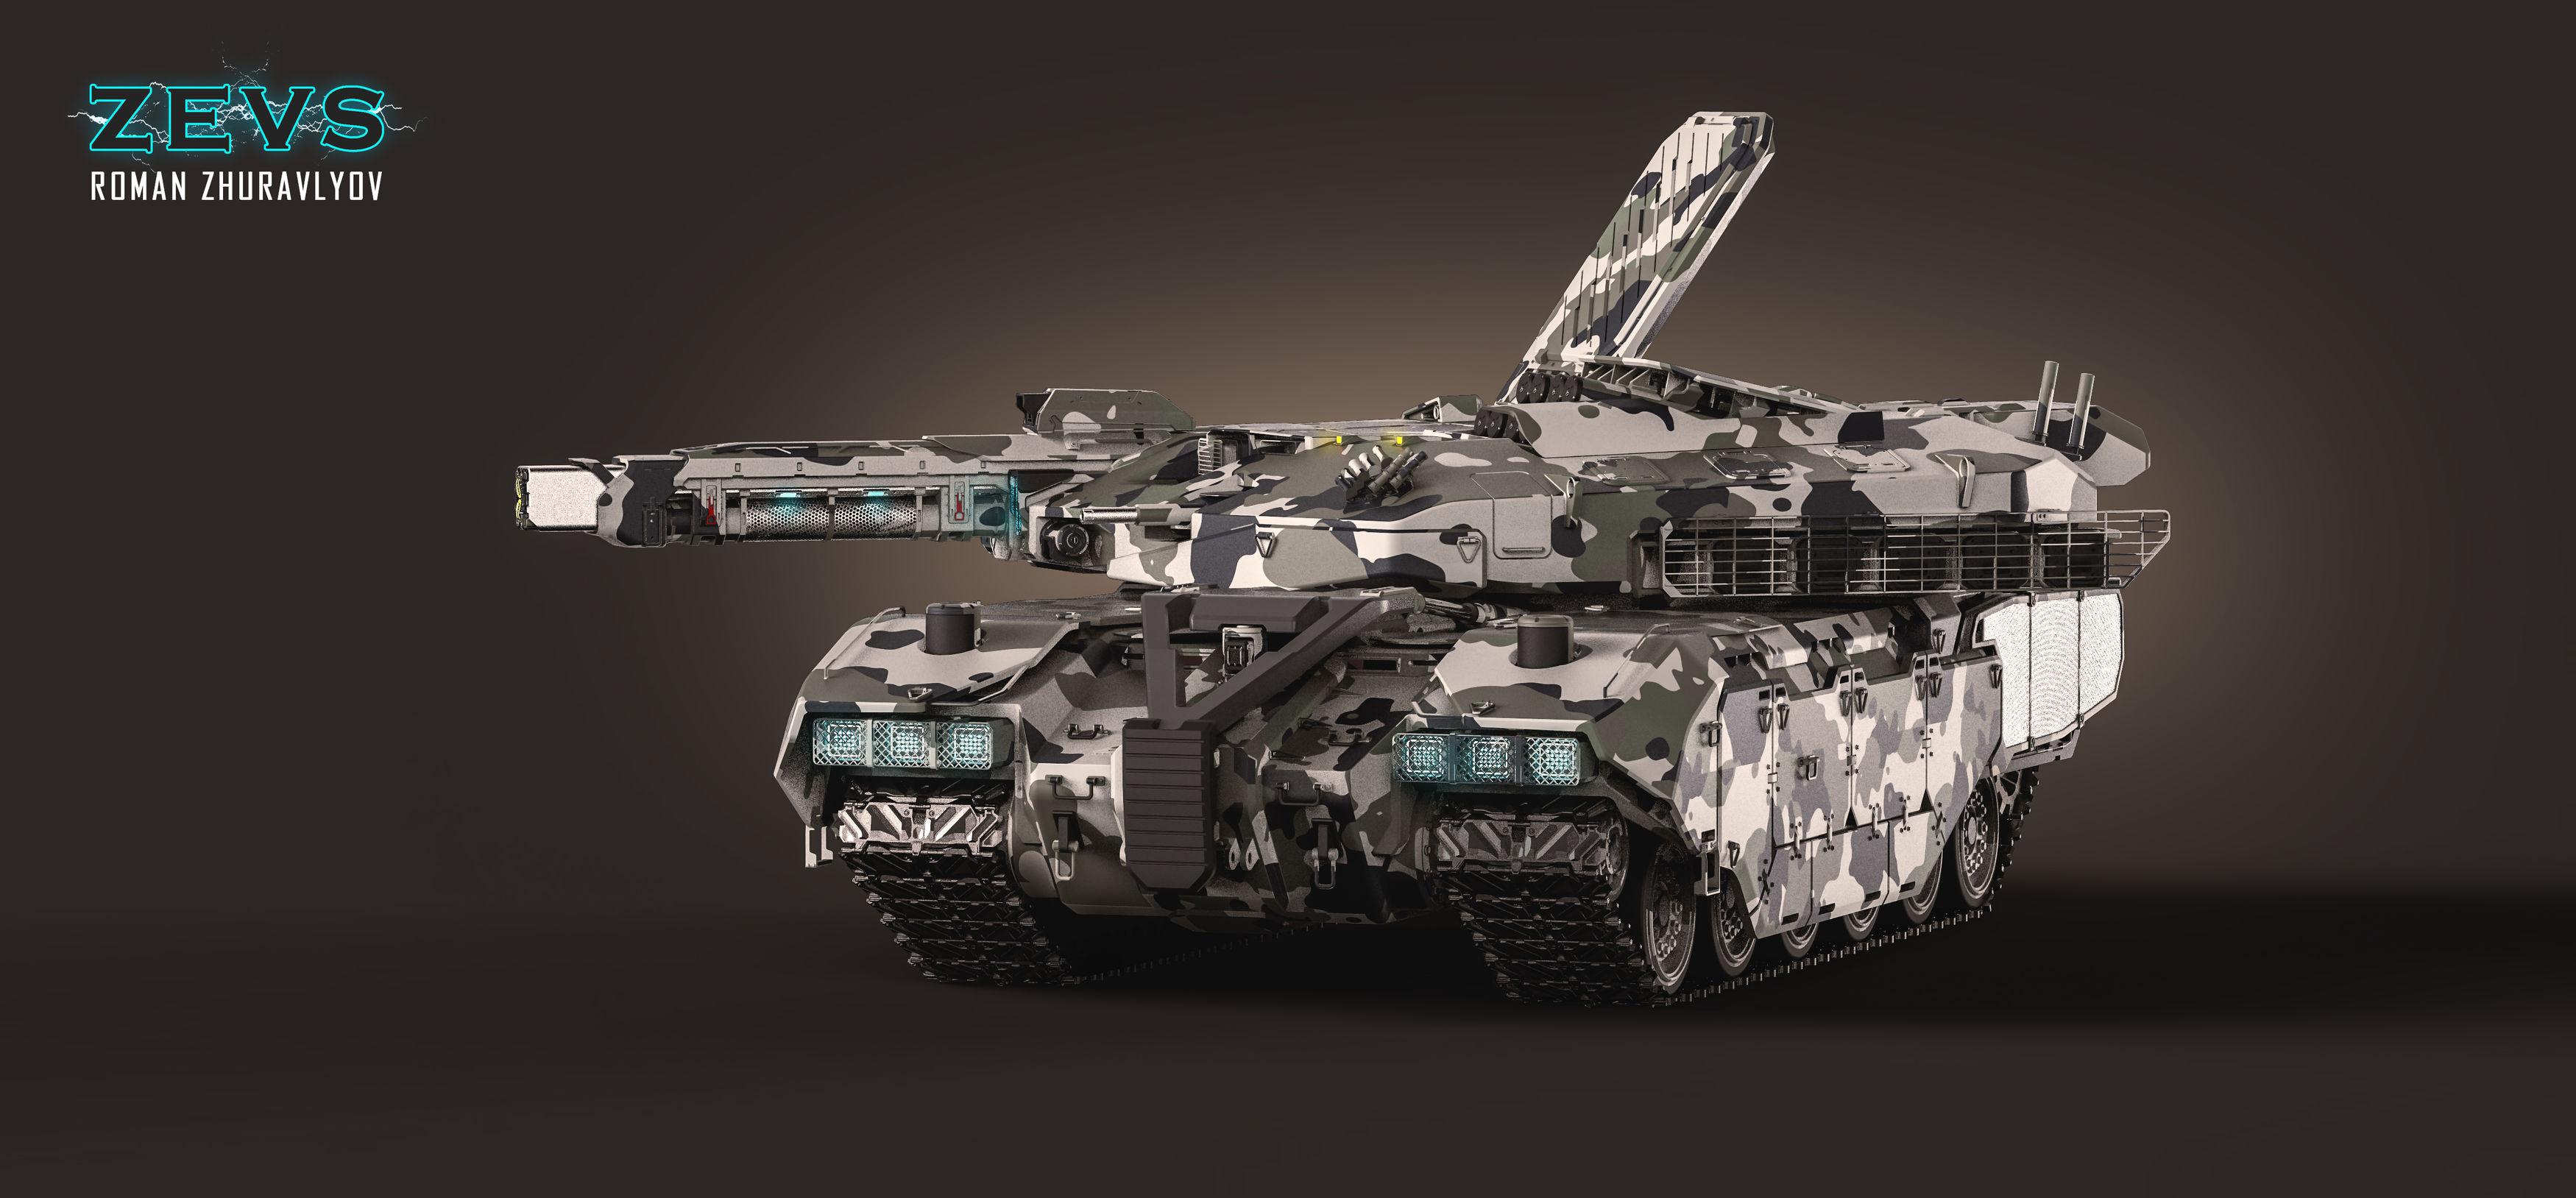 Tank-zevs-6-3500-3500